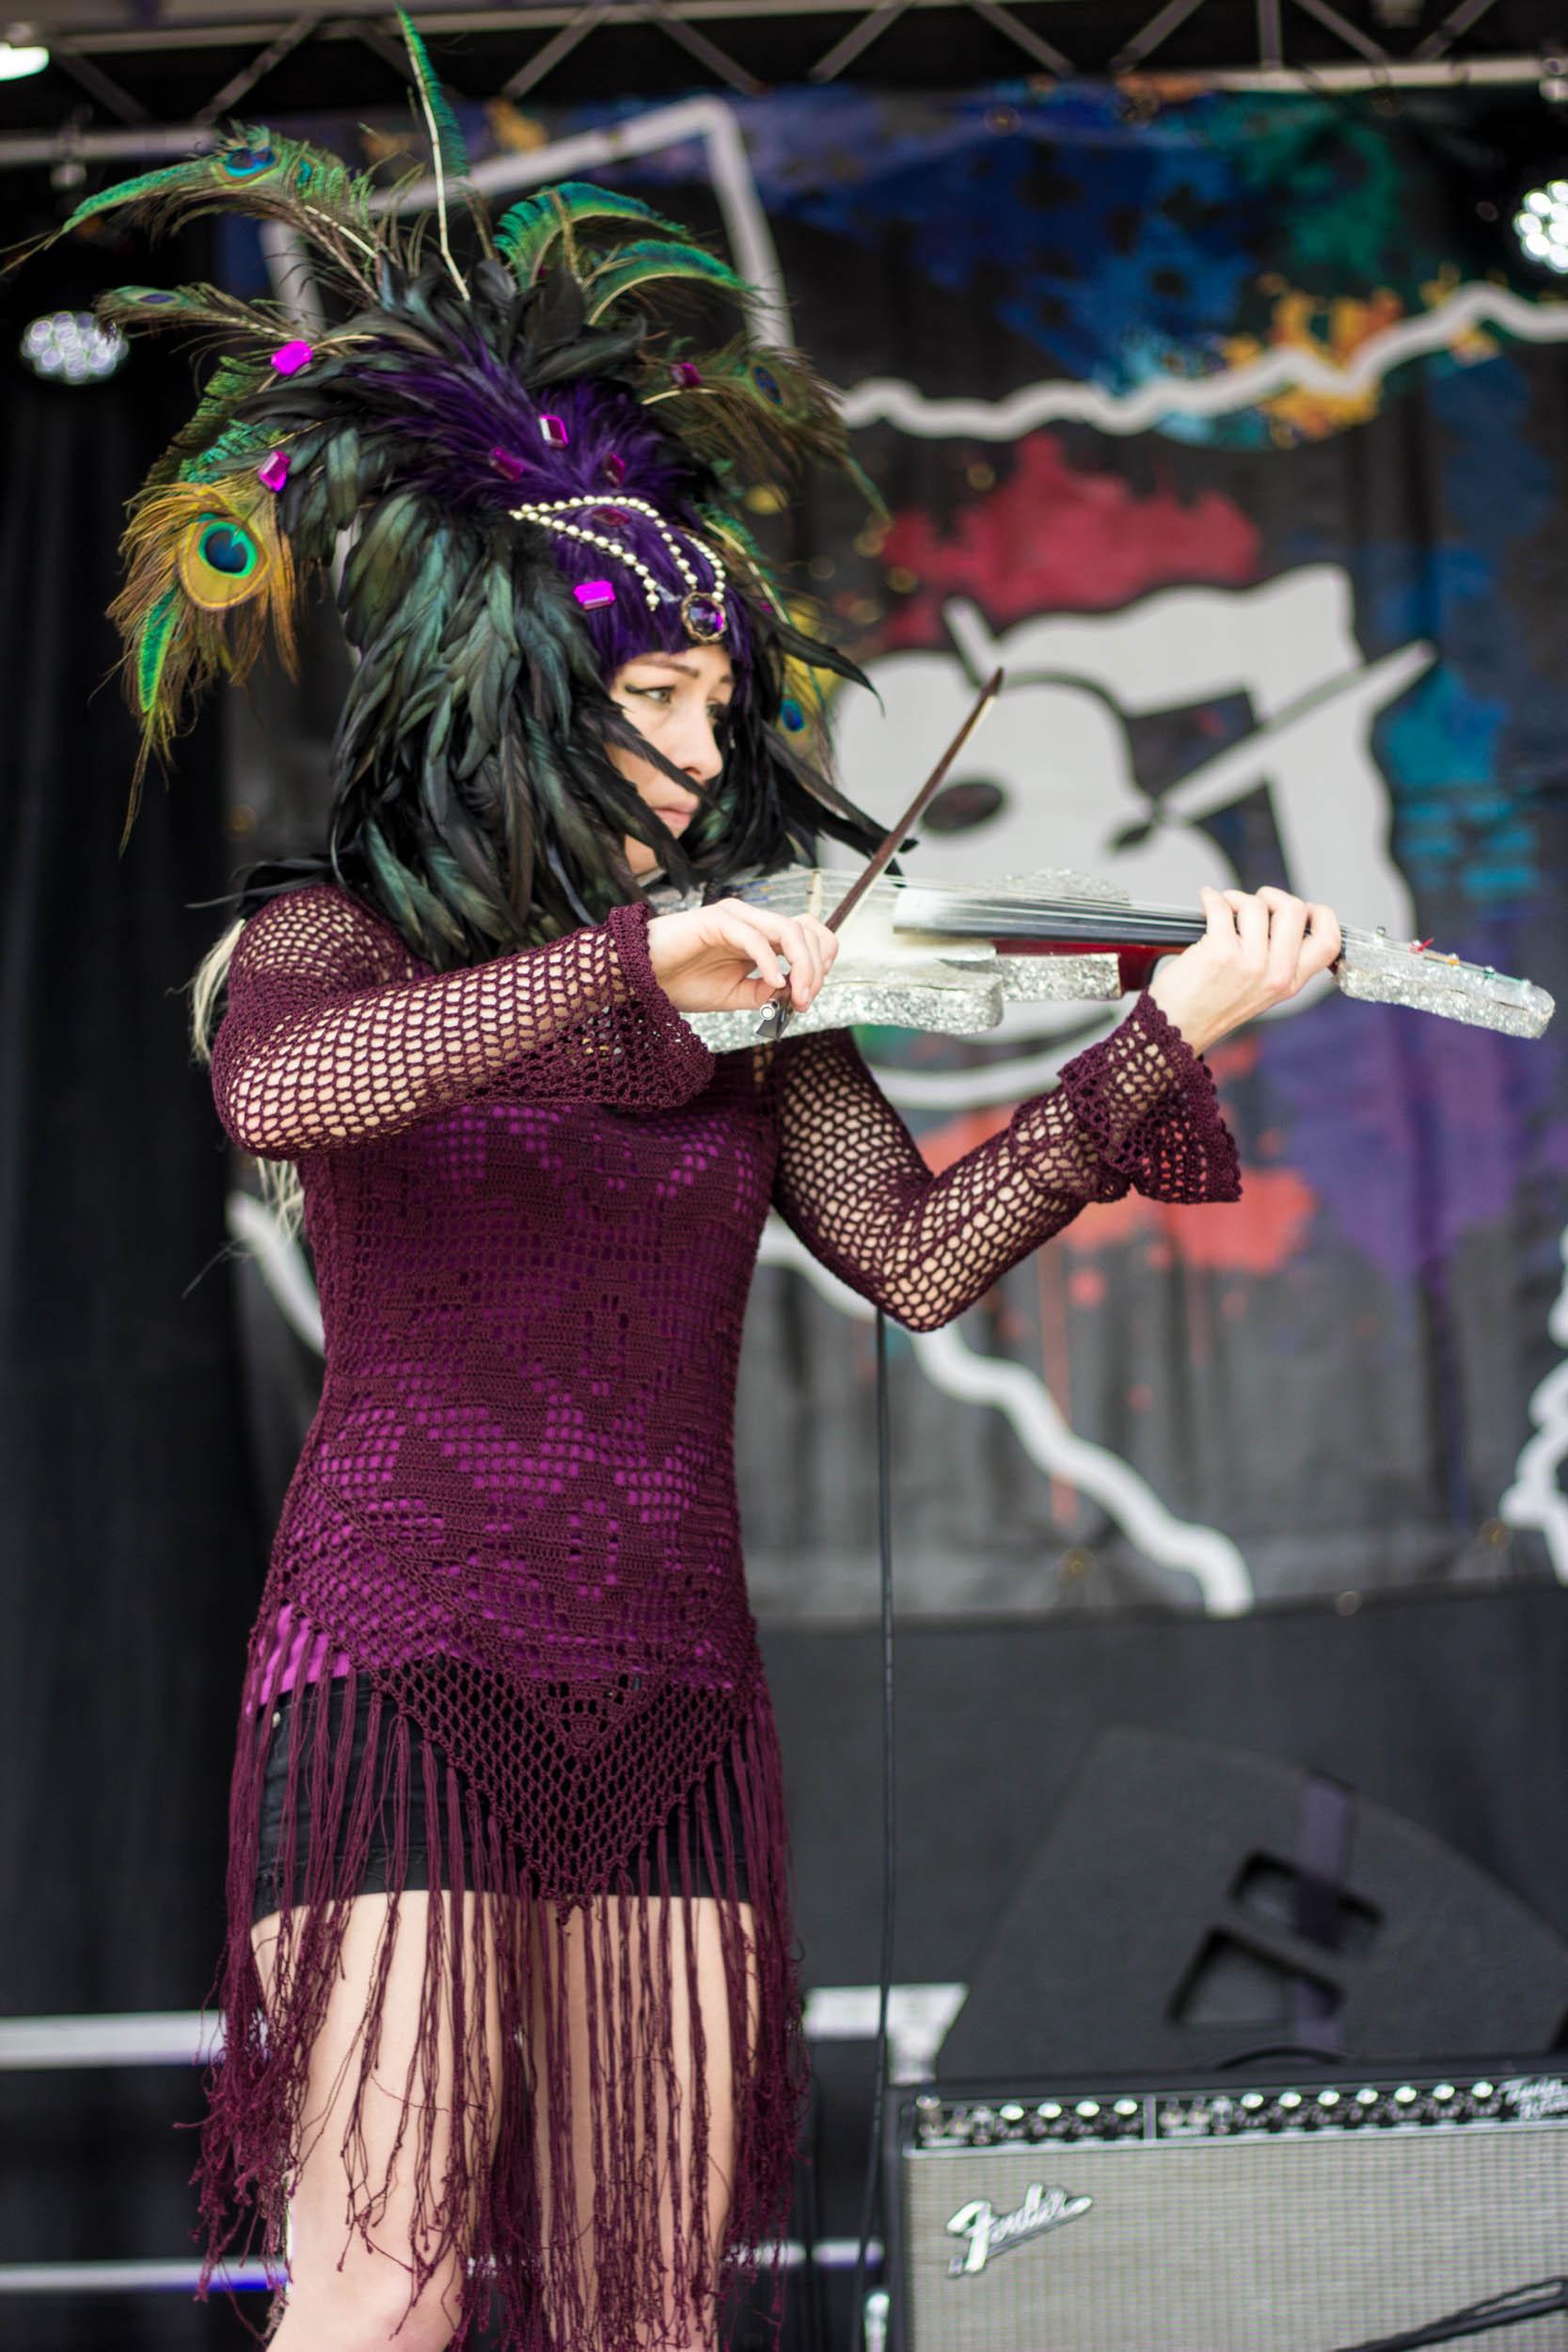 2017 Deep Ellum Arts Festival_Poppy Xander and the Chamber Rock Orchestra-2.jpg